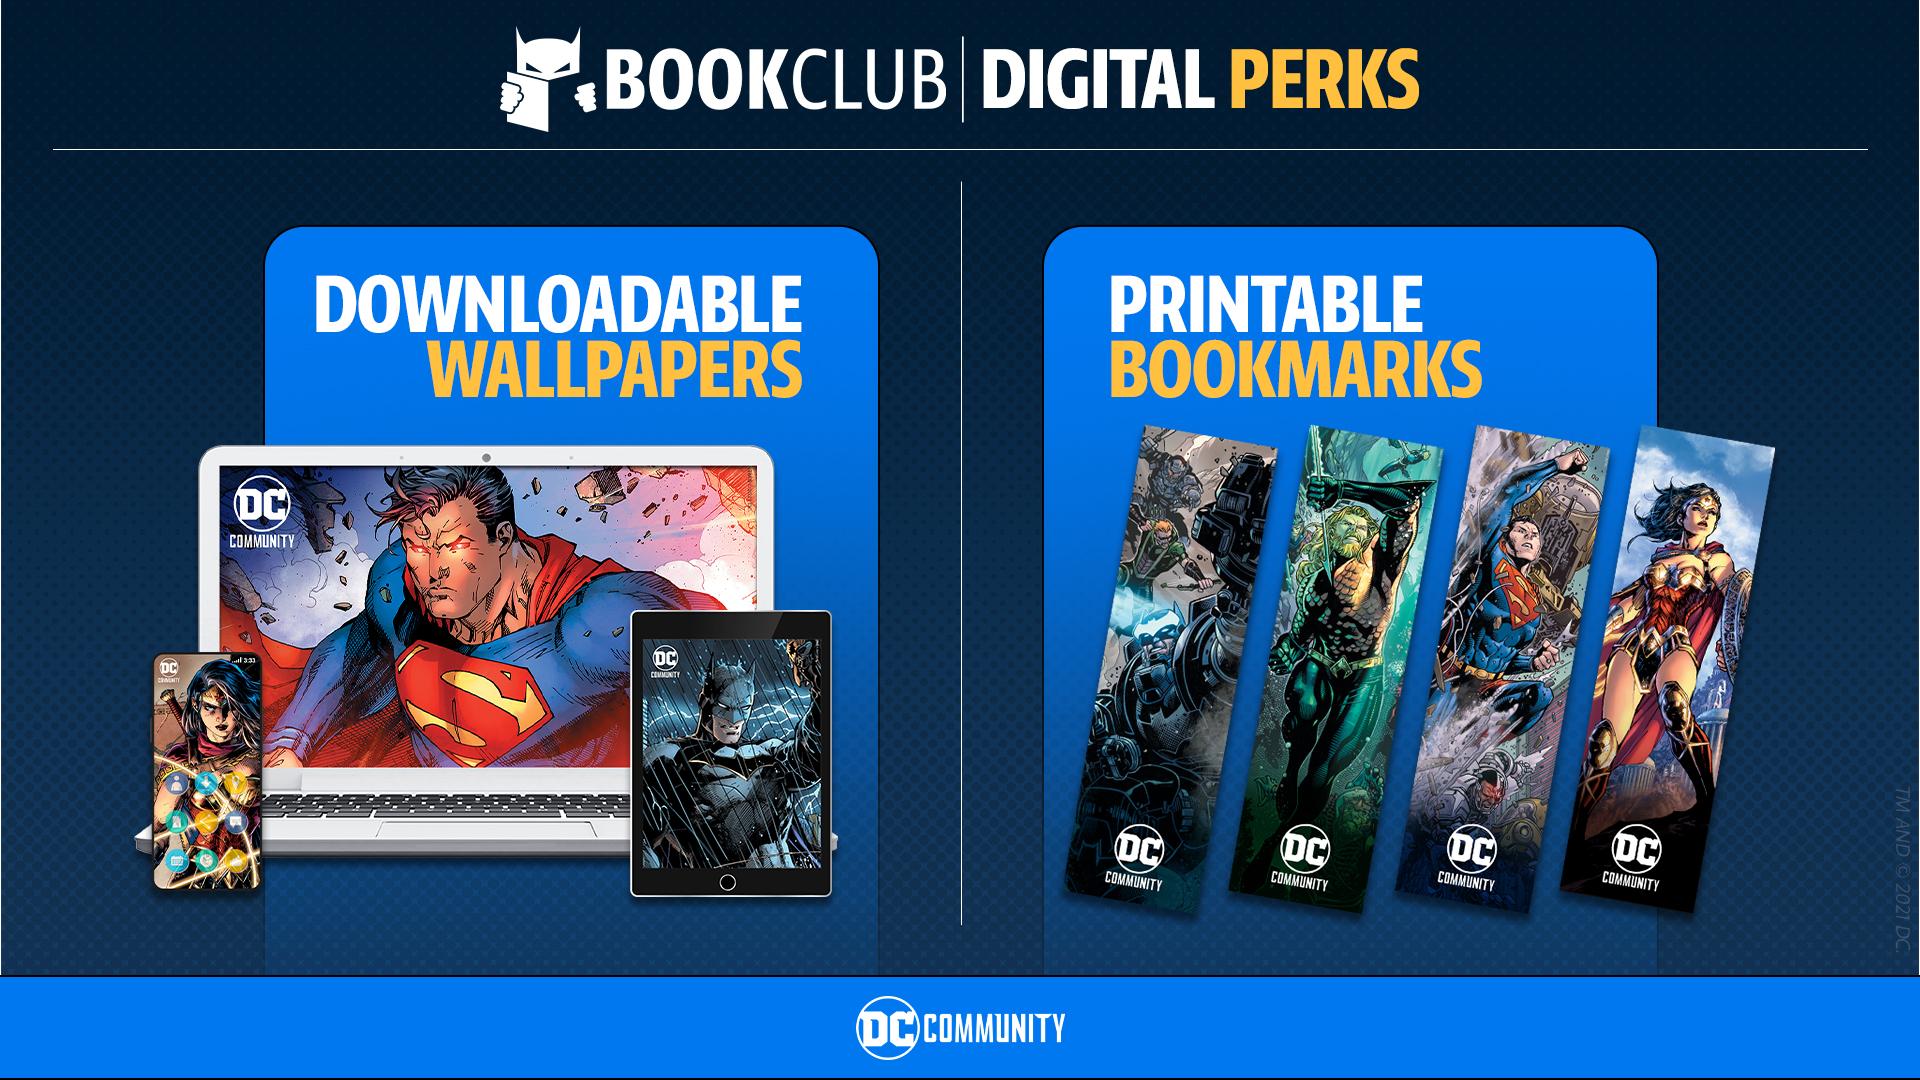 DC Book Club_Digital Perks Social_1920x1080